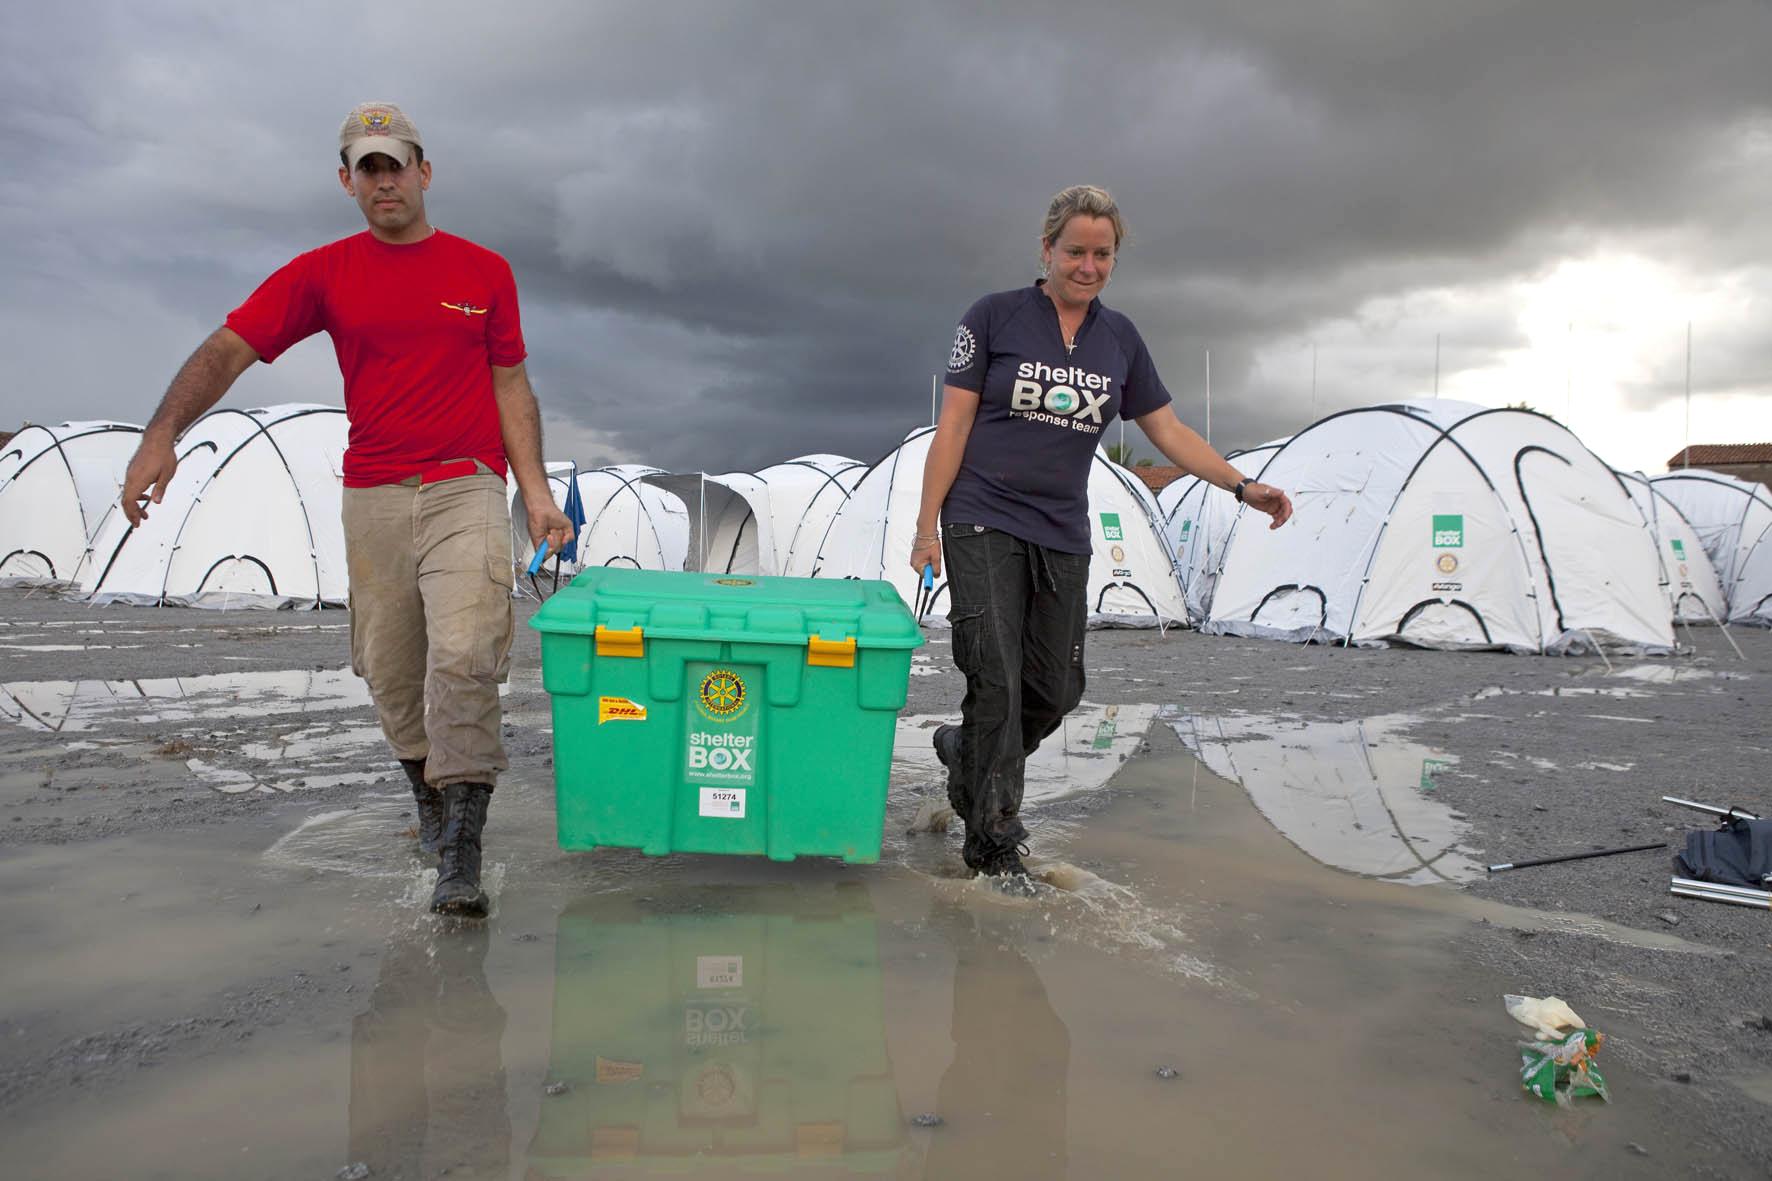 SRT Jodie Hurt (UK) with a Brazilian at Shelterbox camp at Uniao Dos Palmares, Alegoas, Brazil